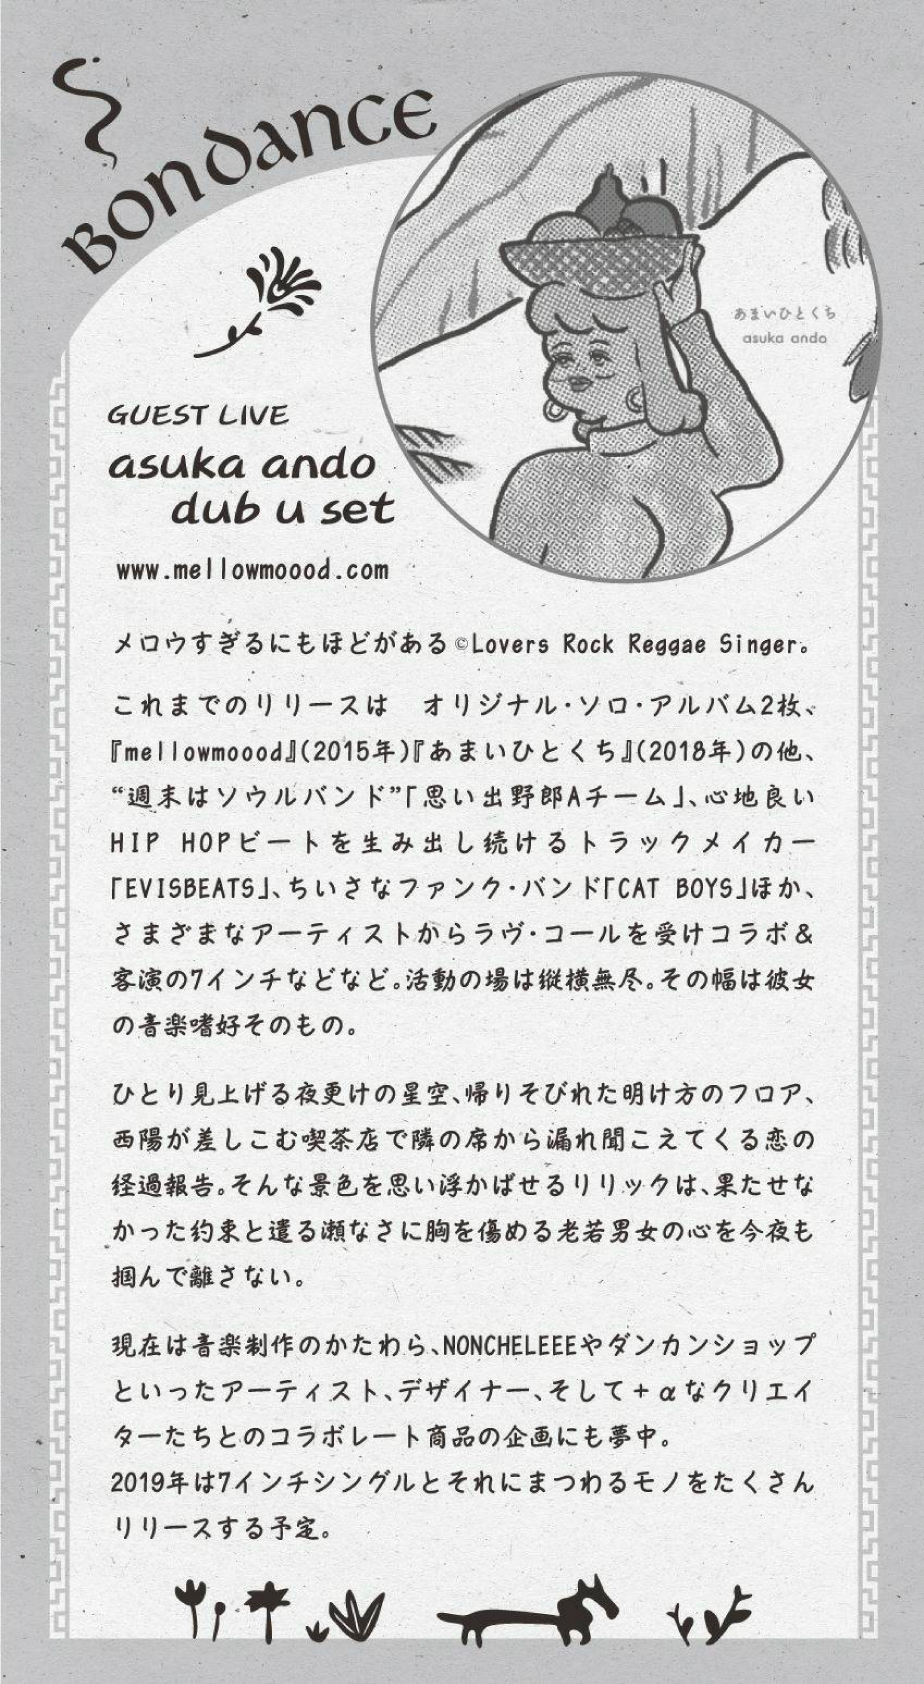 """ BONDANCE "" Guest: asuka andoチラシ2"